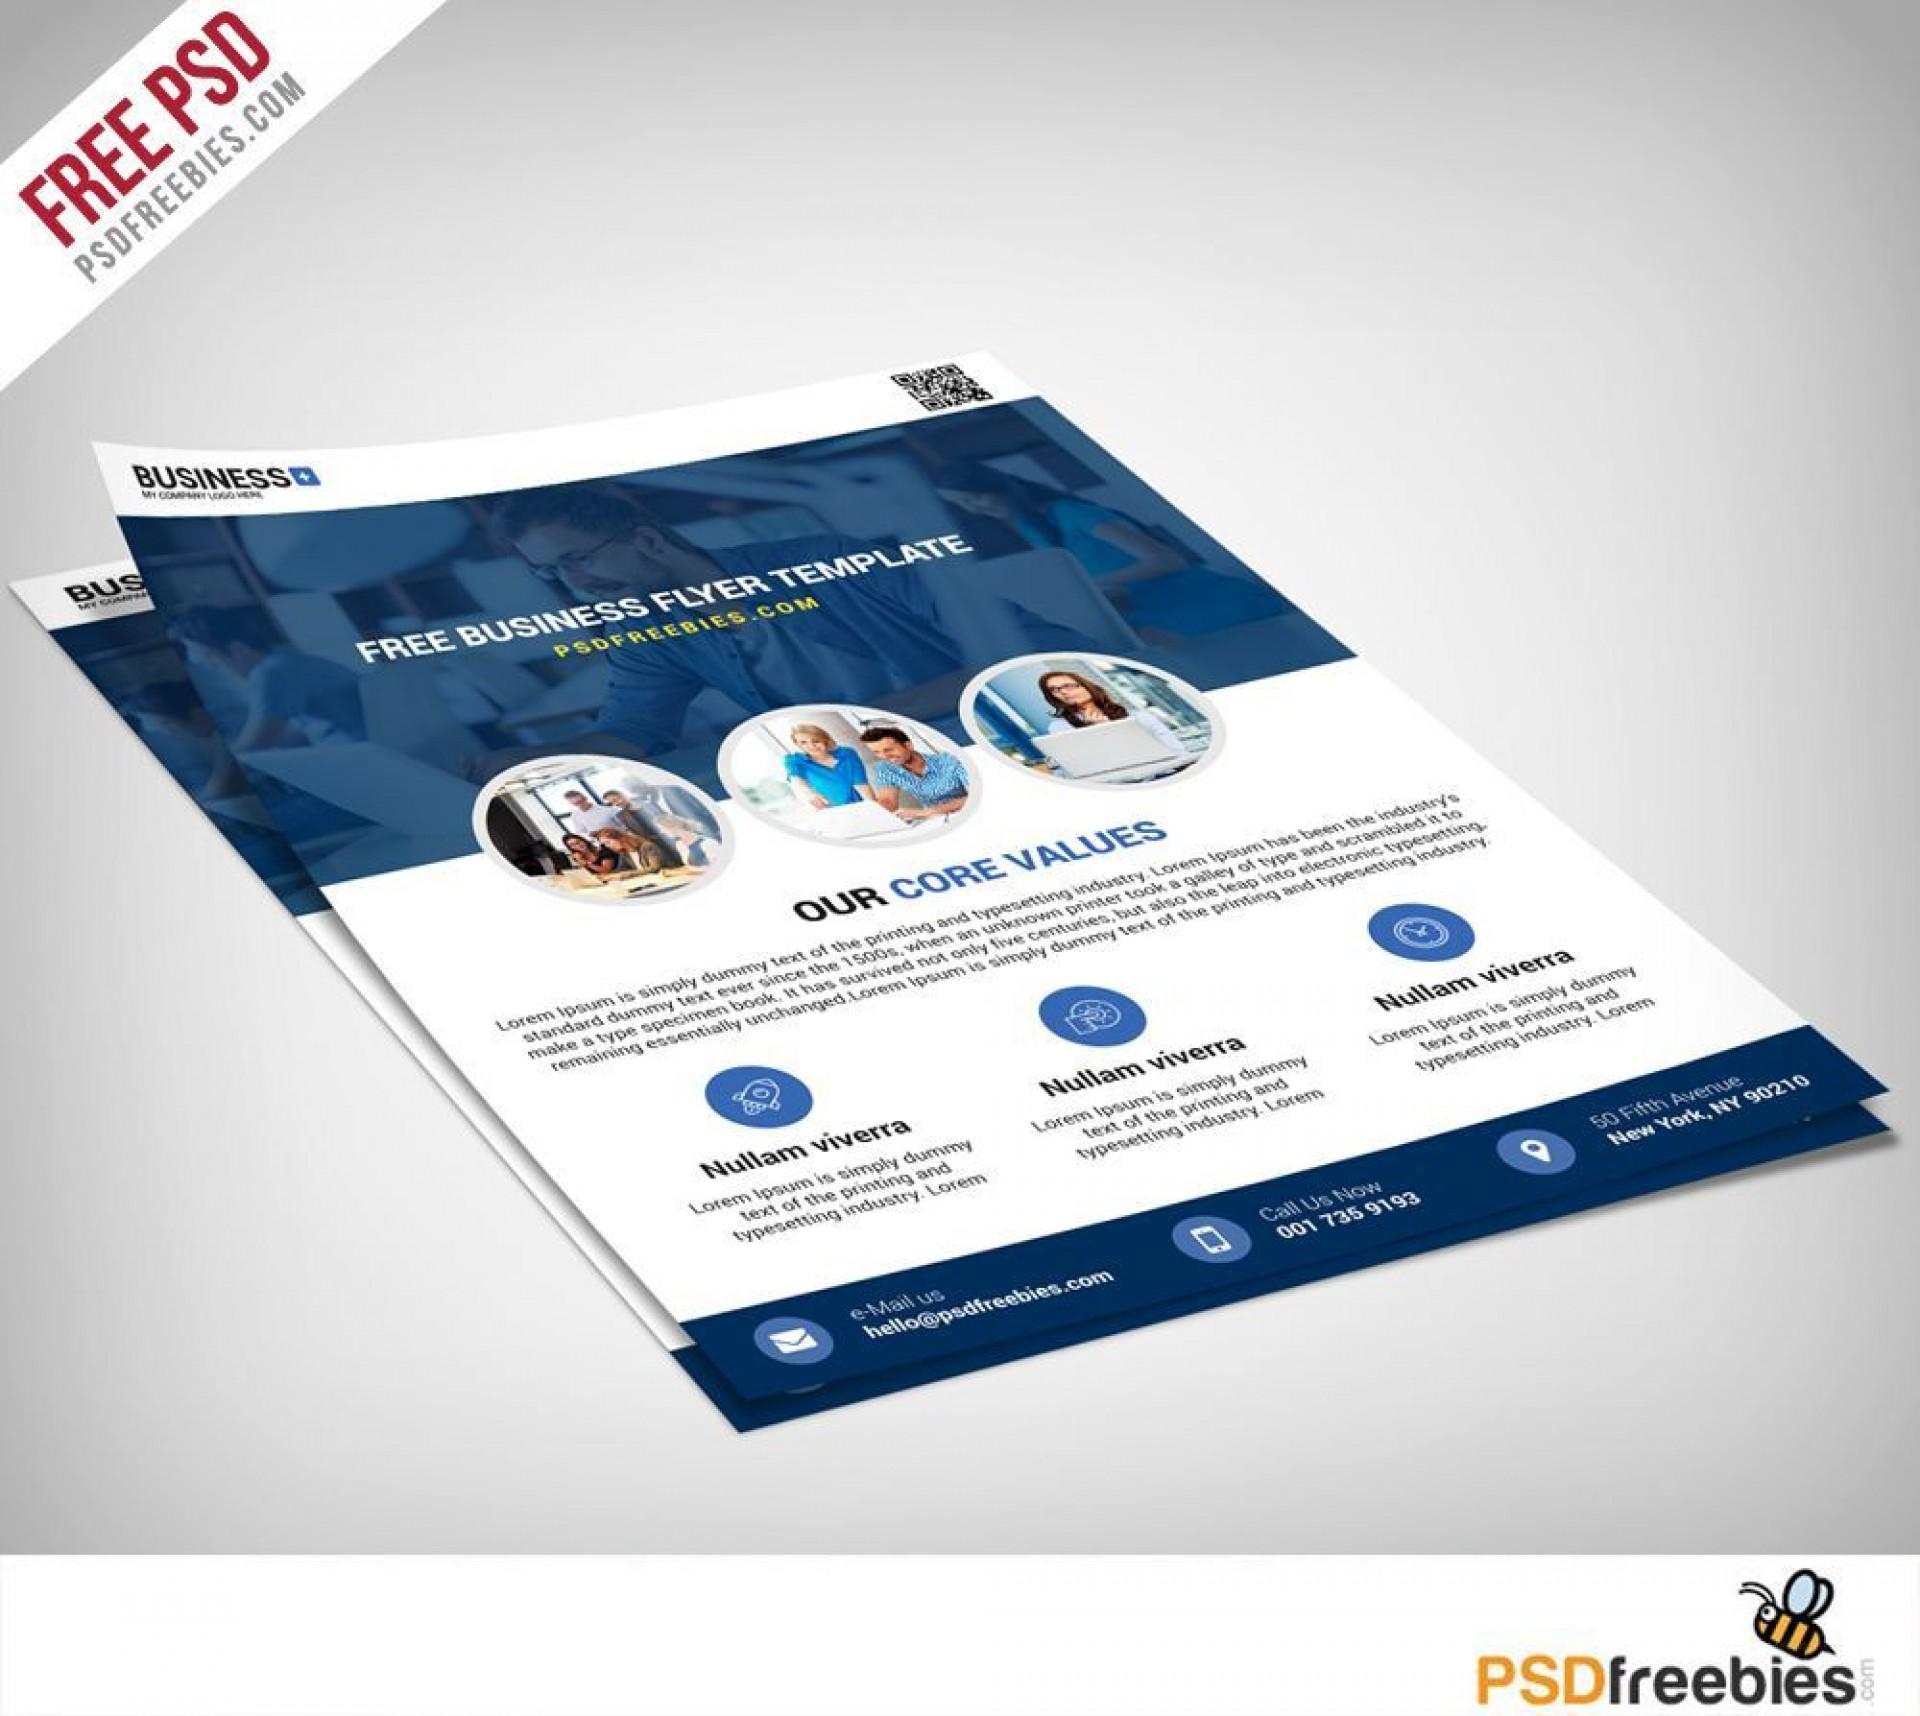 004 Formidable Free Brochure Template Photoshop Download Idea  Tri Fold1920